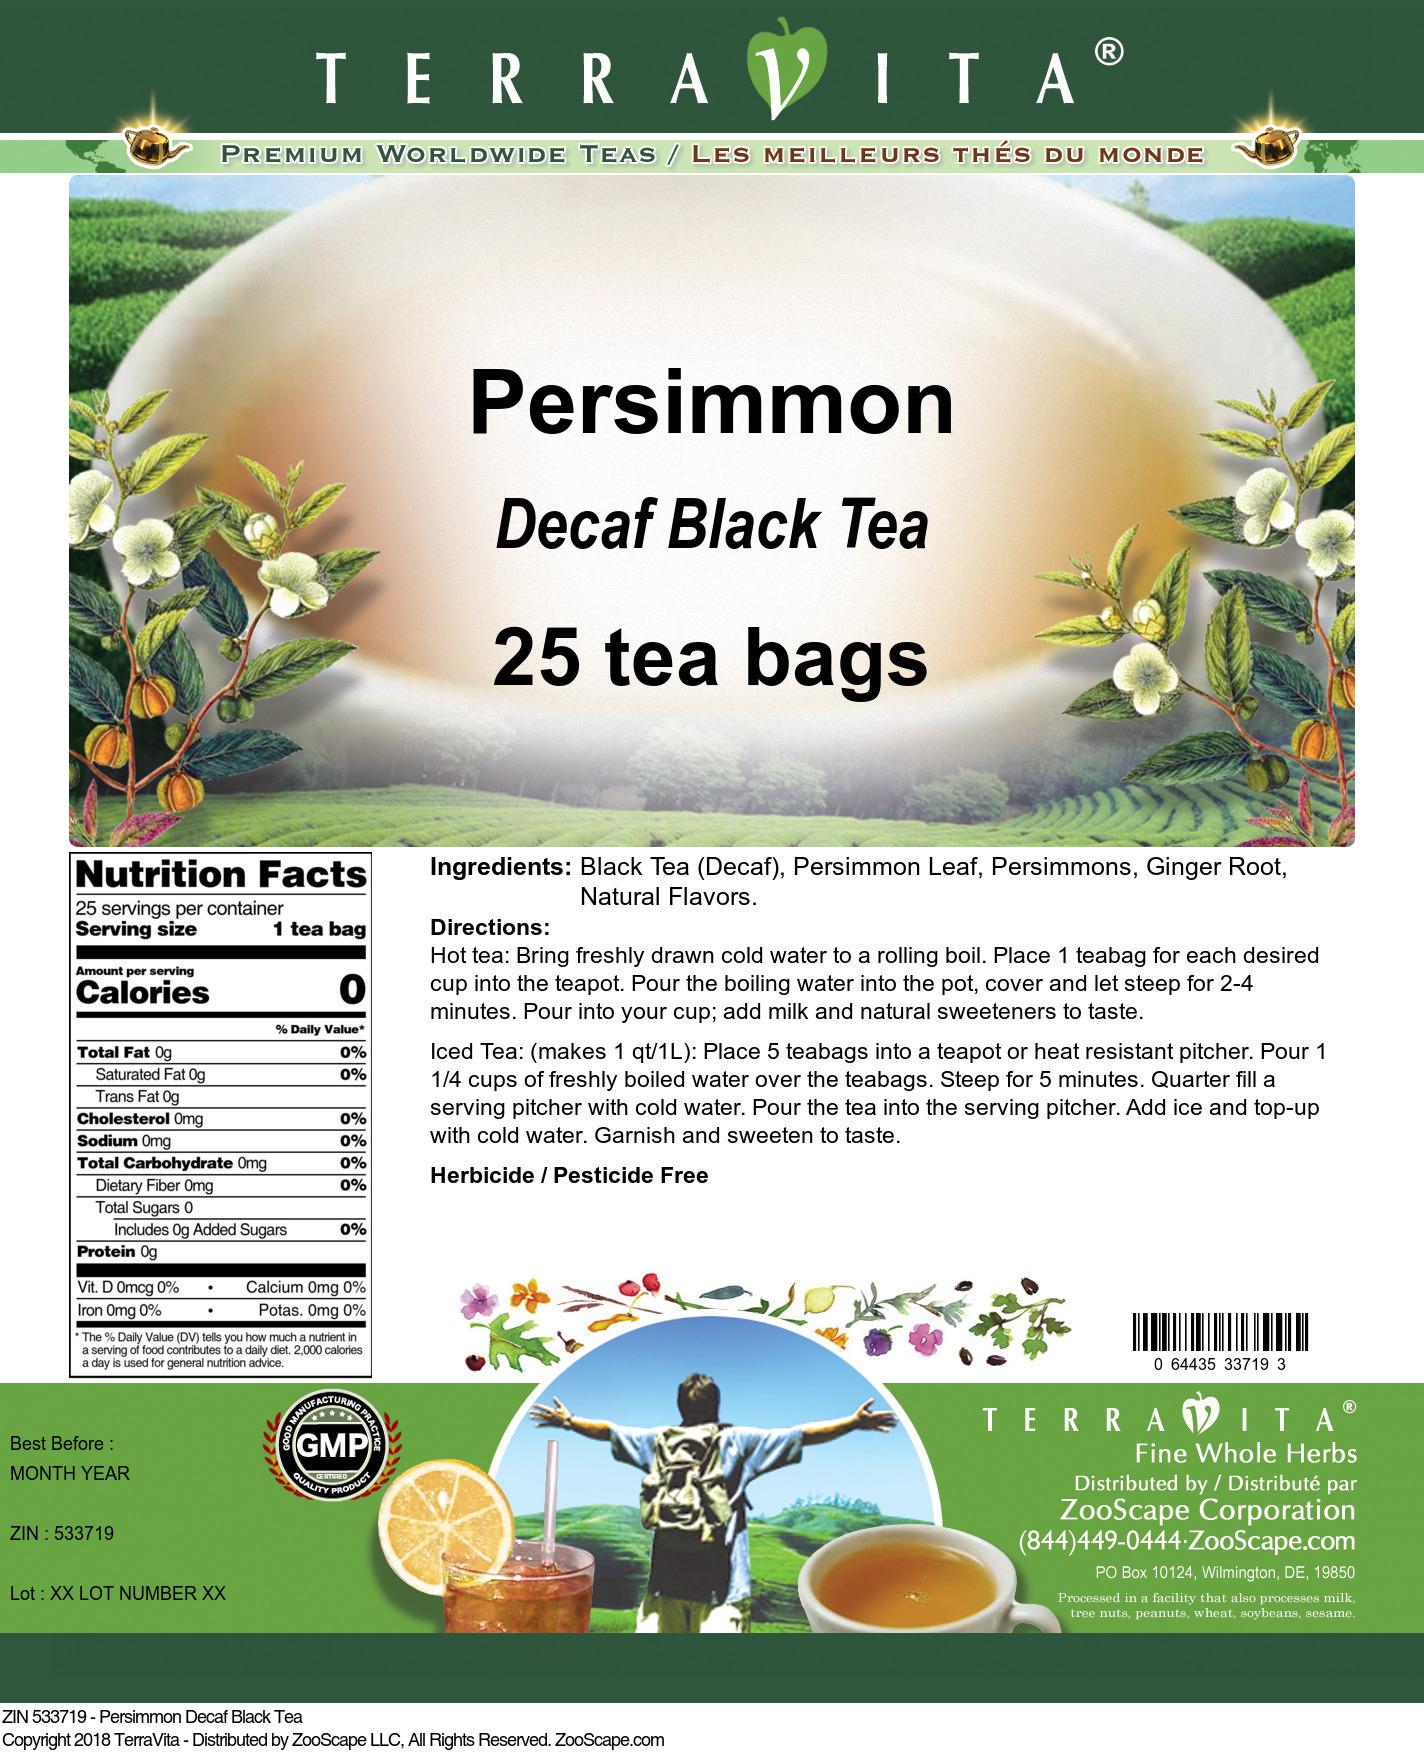 Persimmon Decaf Black Tea